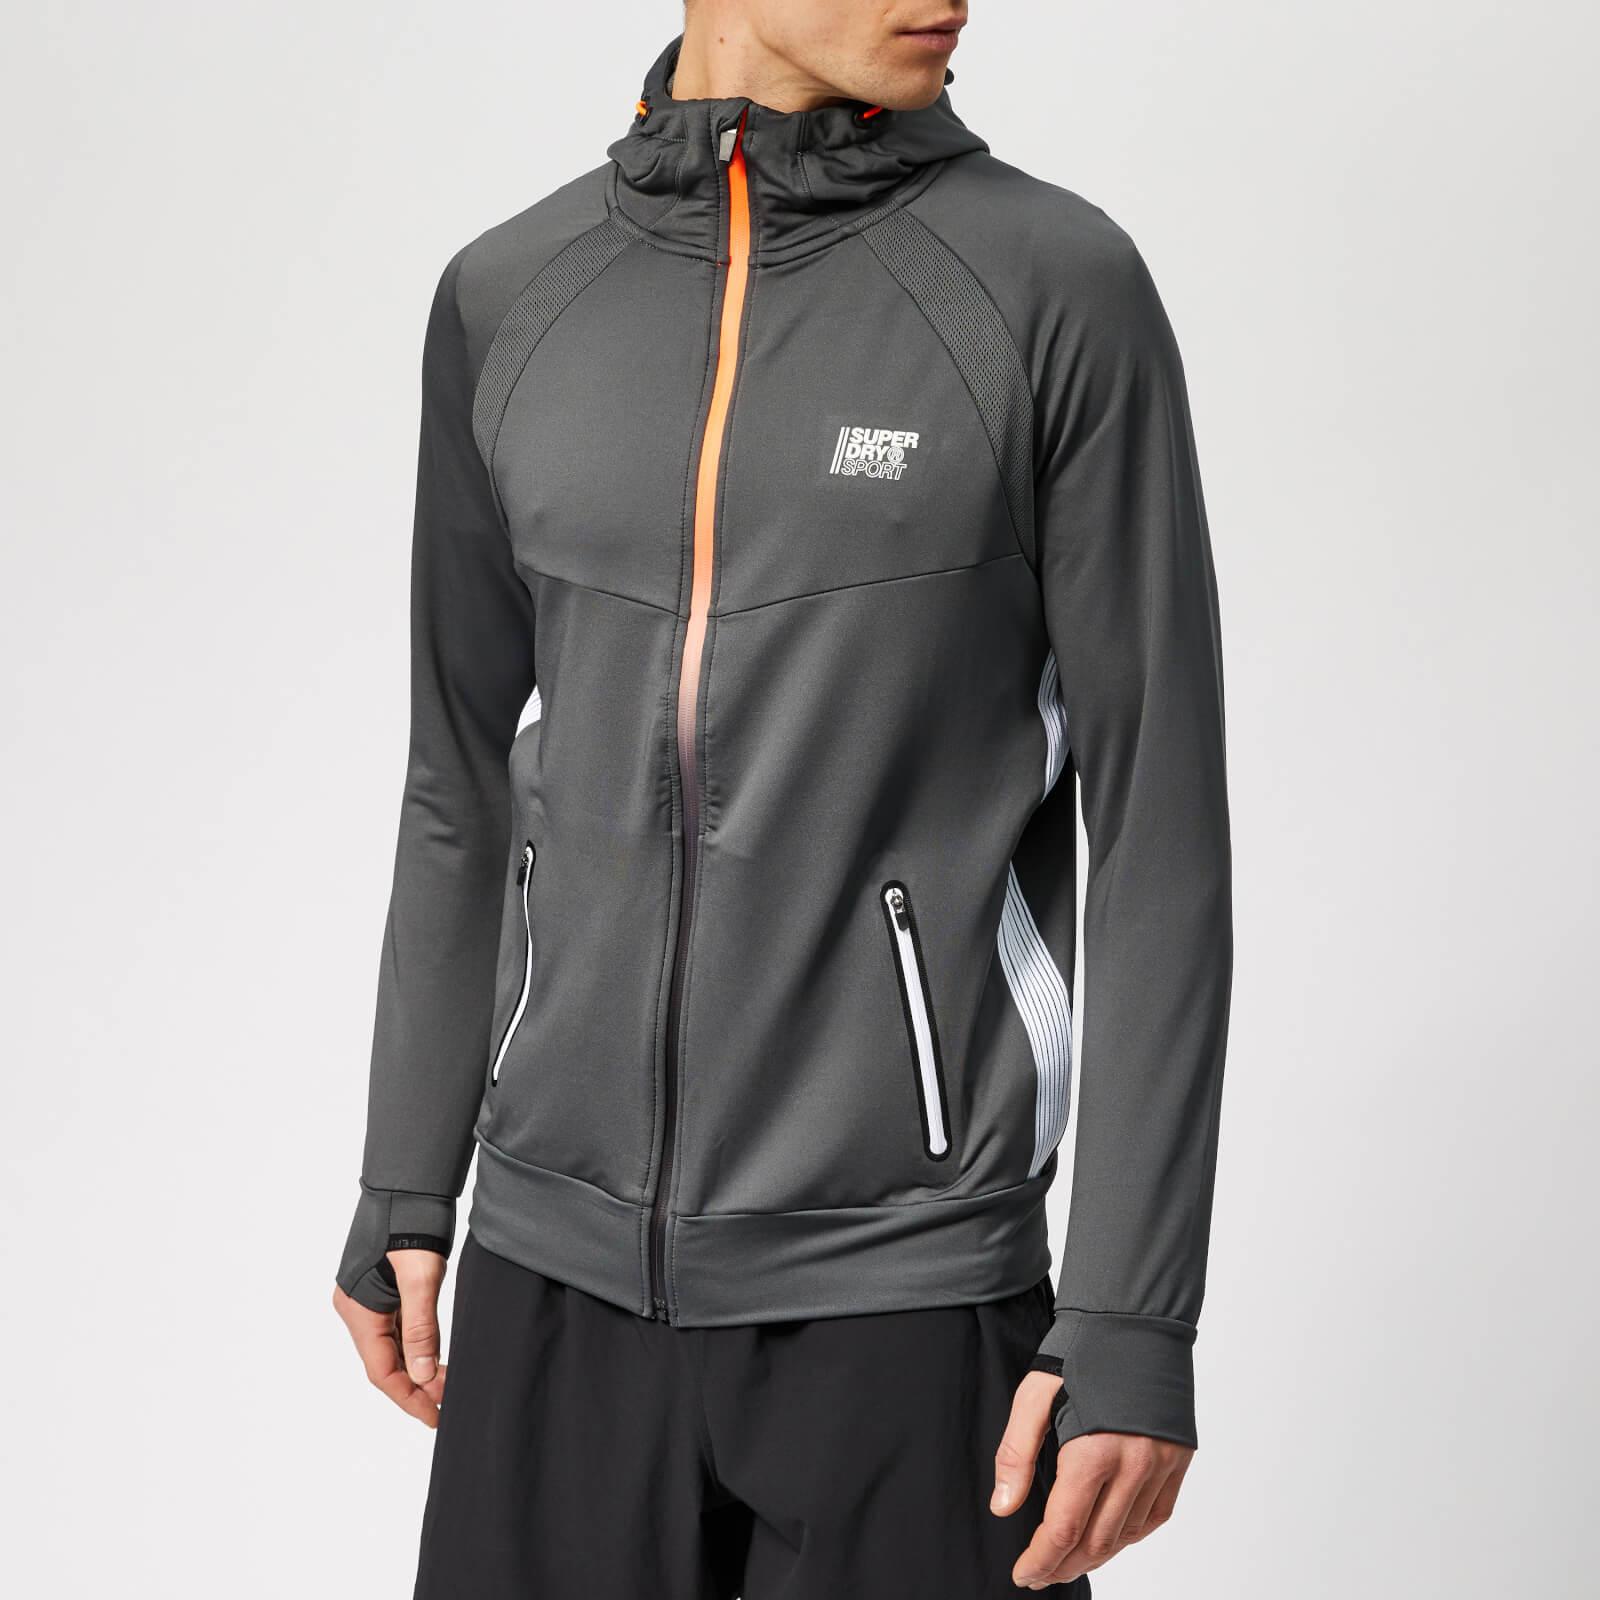 Superdry Sport Men's Active Training Zip Hoody - Cool Olive - L - Grey